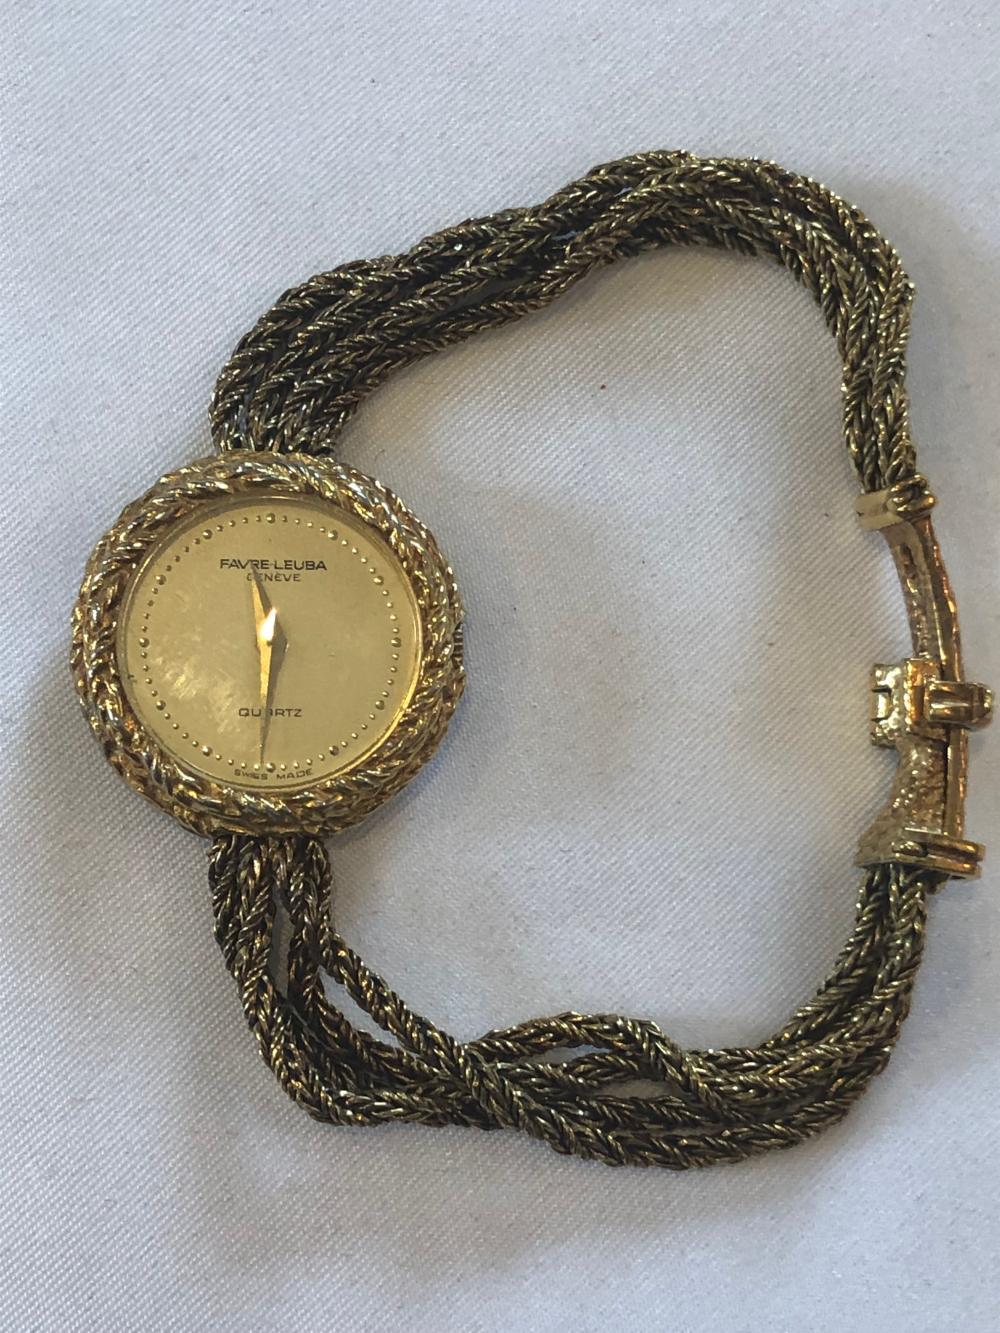 Favre-Leuba Ladies Gold Filled Watch